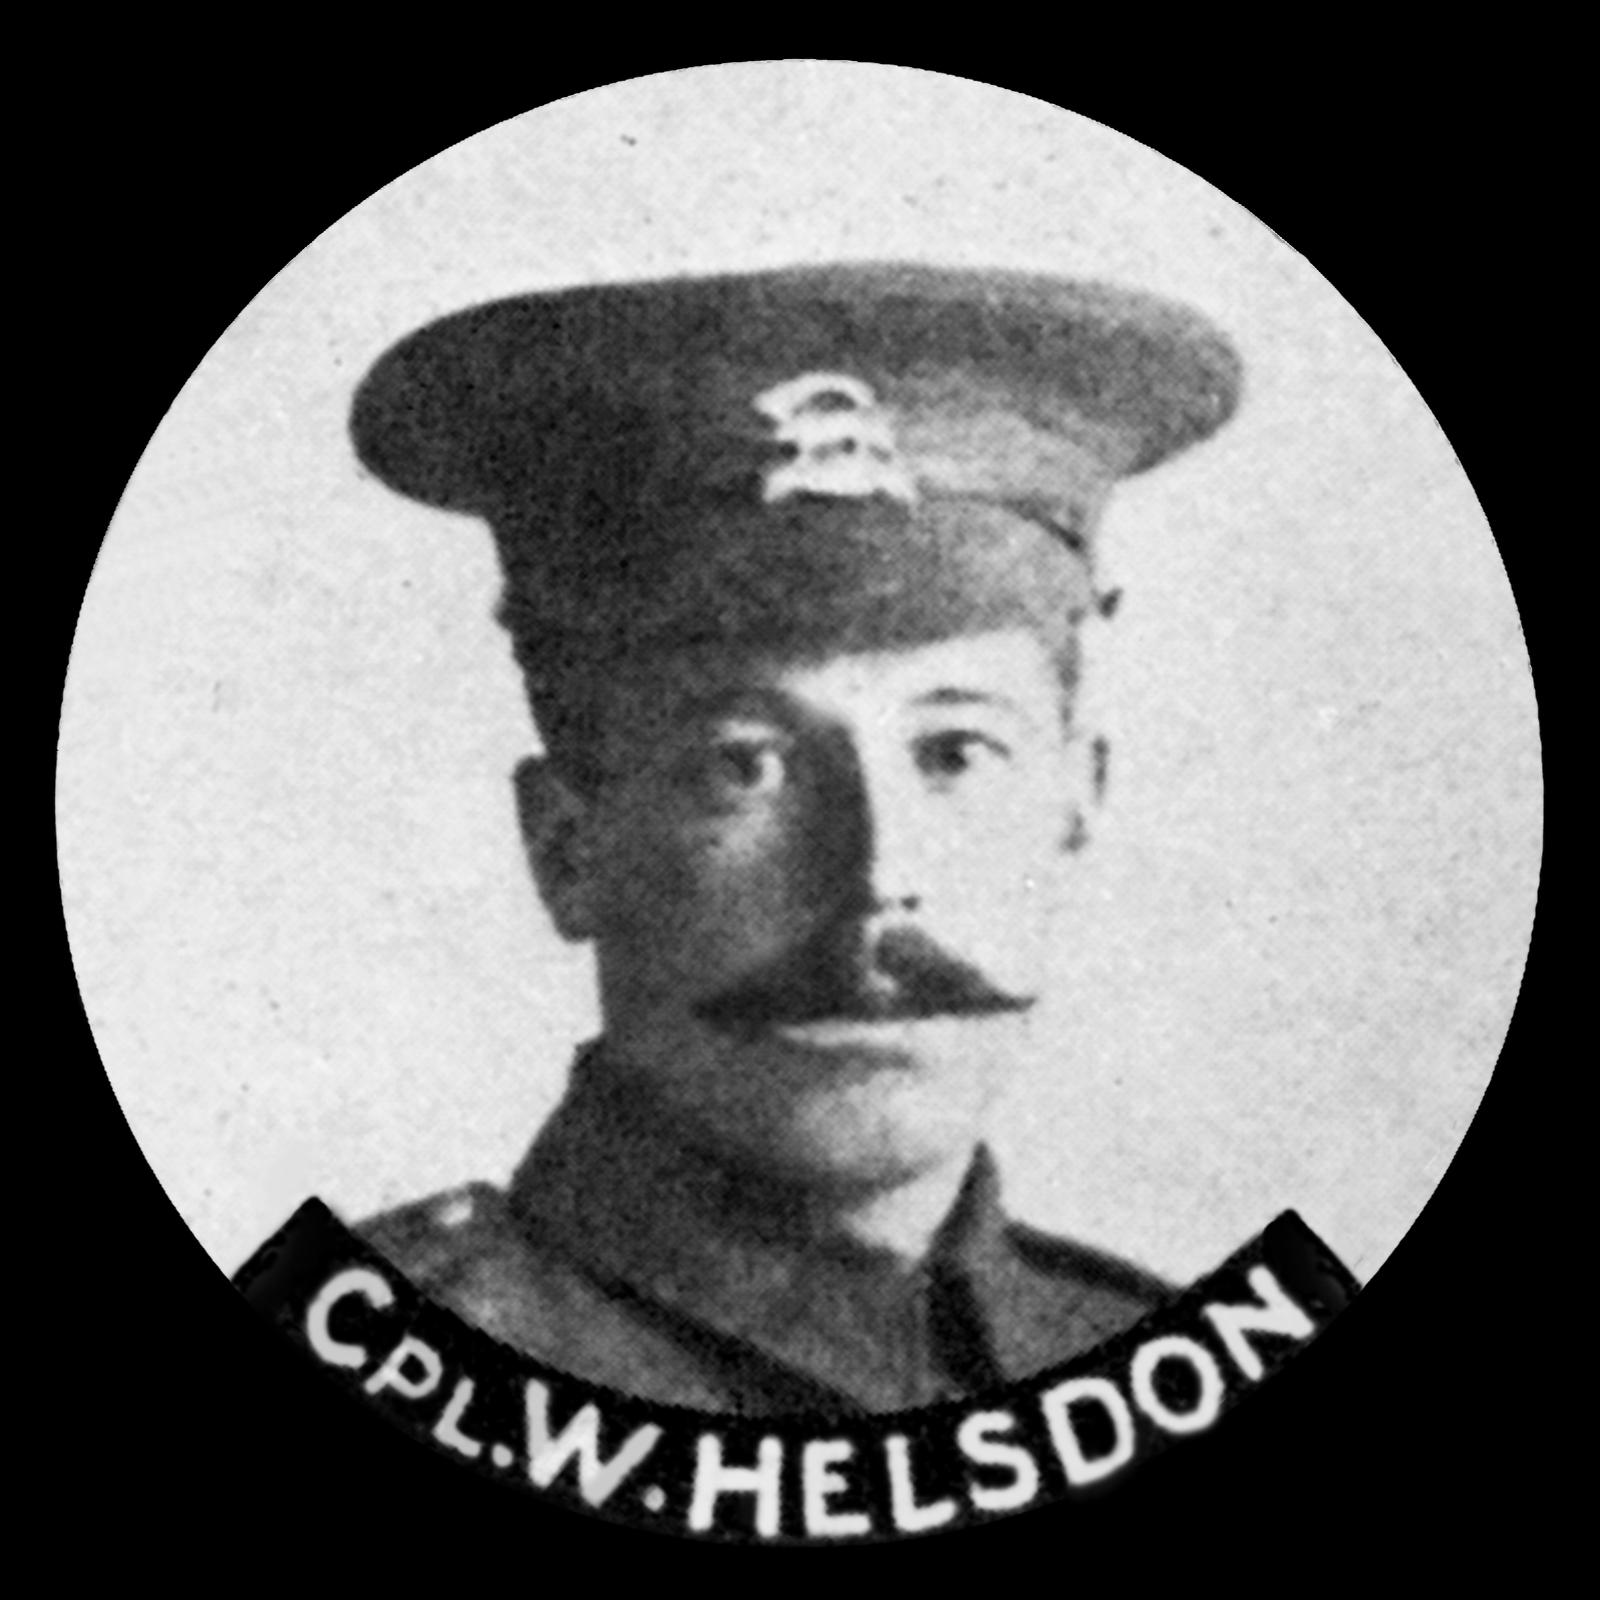 HELSDON William